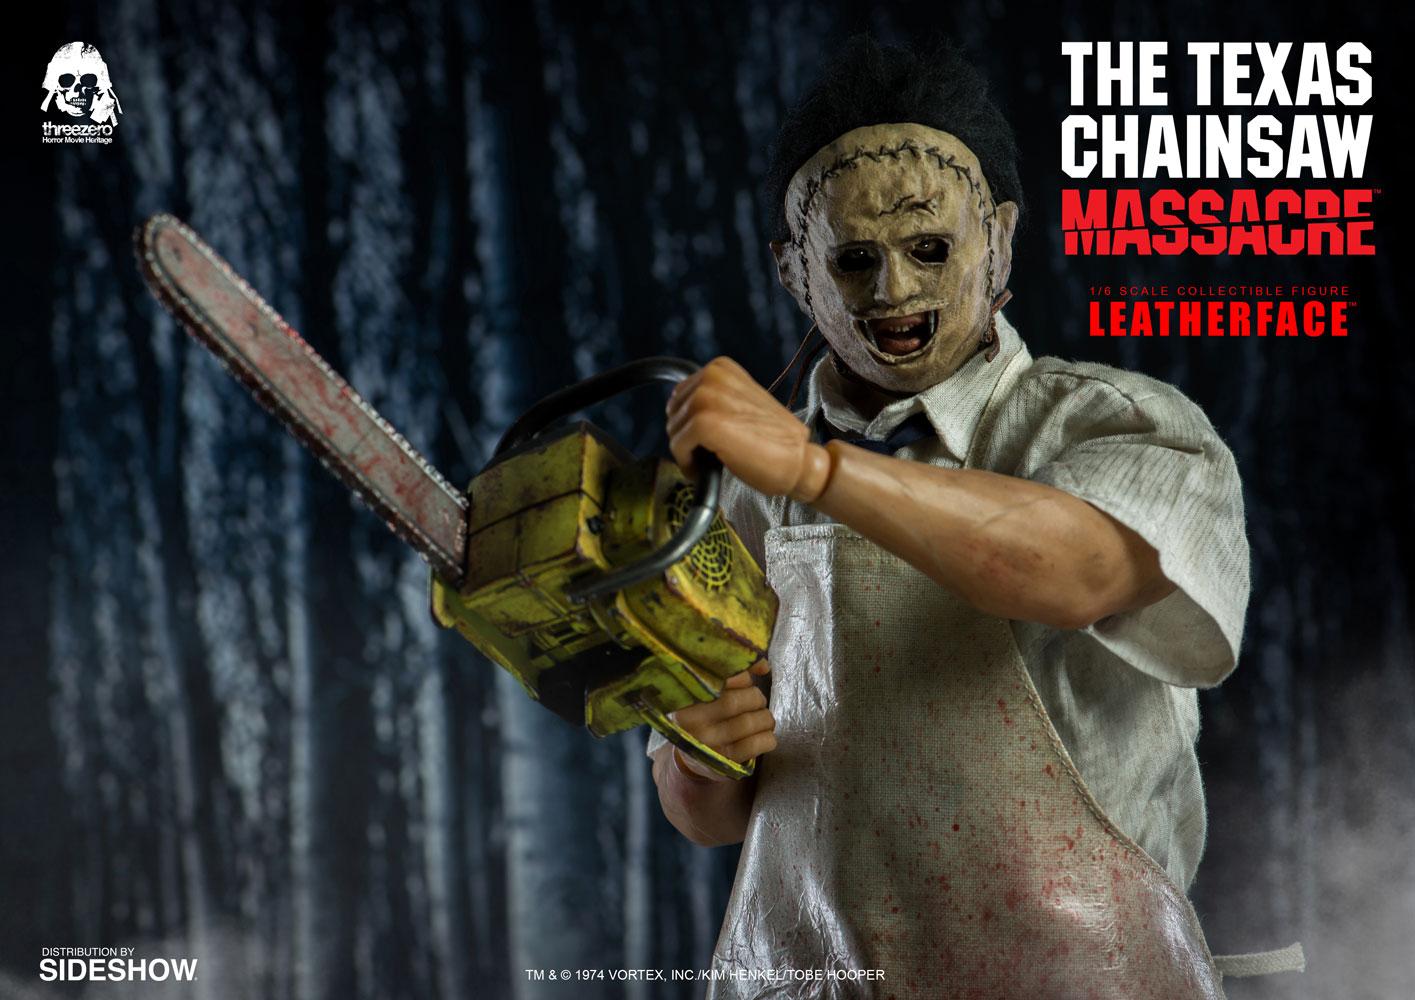 THE TEXAS CHAIN SAW MASSACRE / THE TEXAS CHAINSAW MASSACRE ...   Texas Chainsaw Massacre